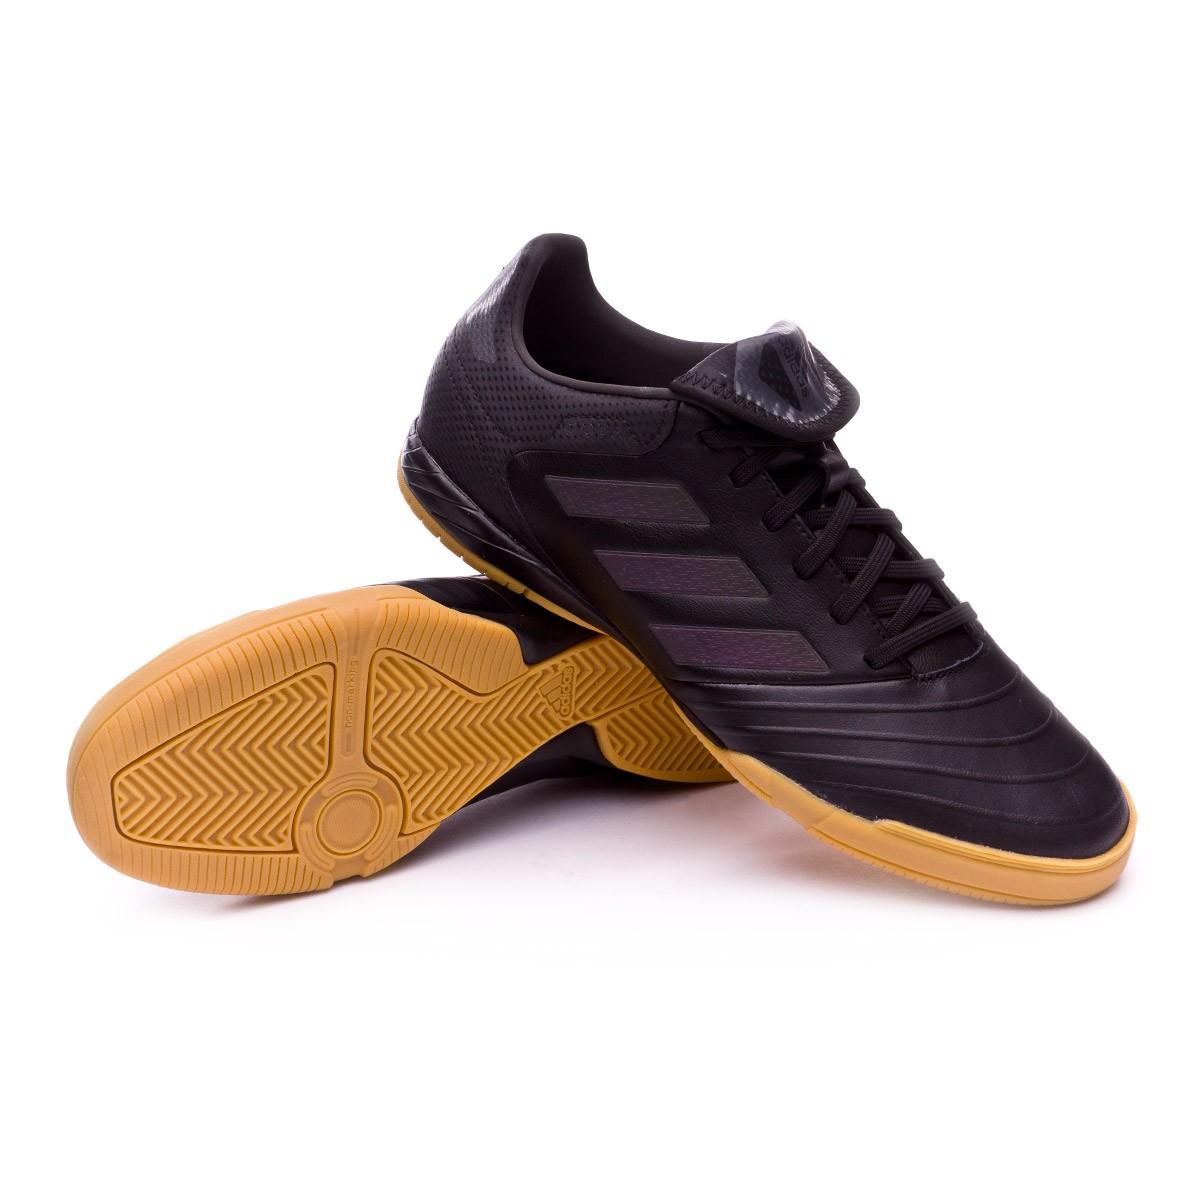 53475b2a5 Futsal Boot adidas Copa Tango 18.3 IN Core black-Utility black ...